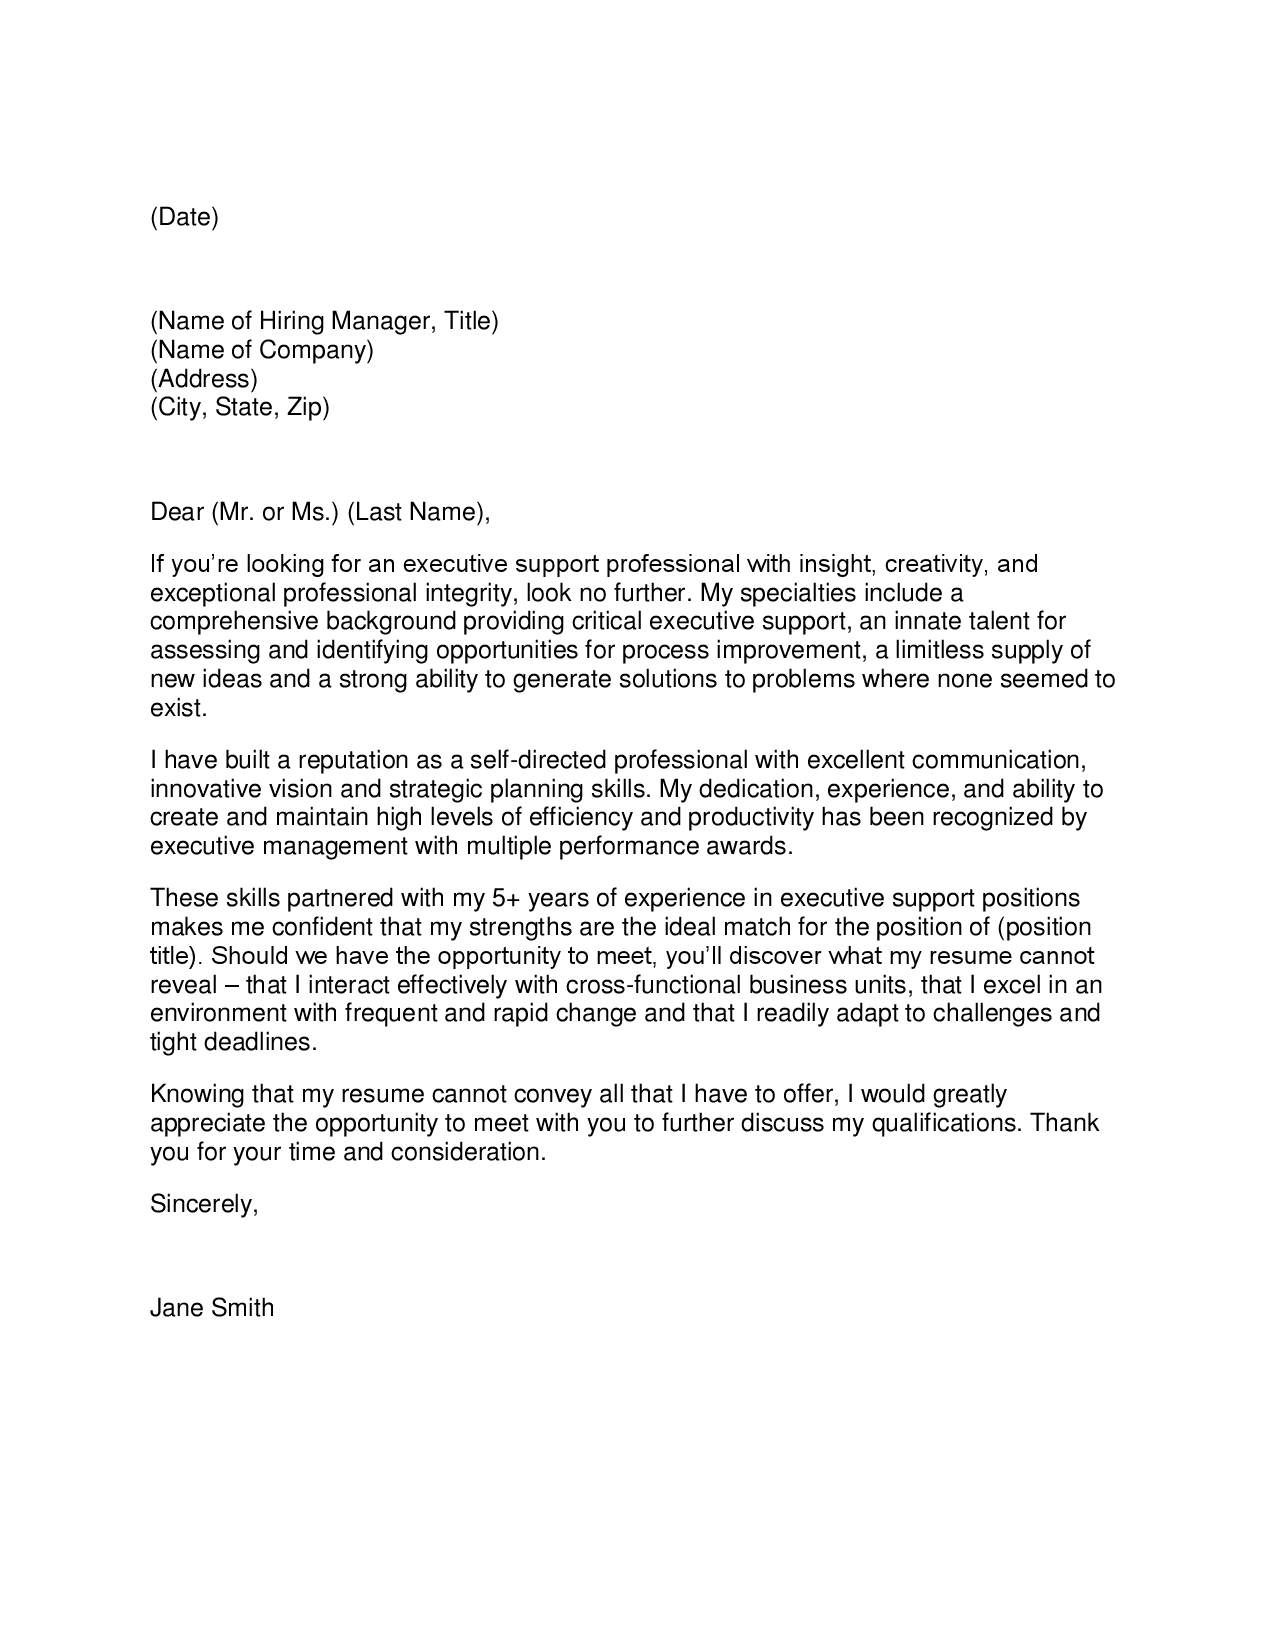 Probation And Parole Officer Cover Letter Sample